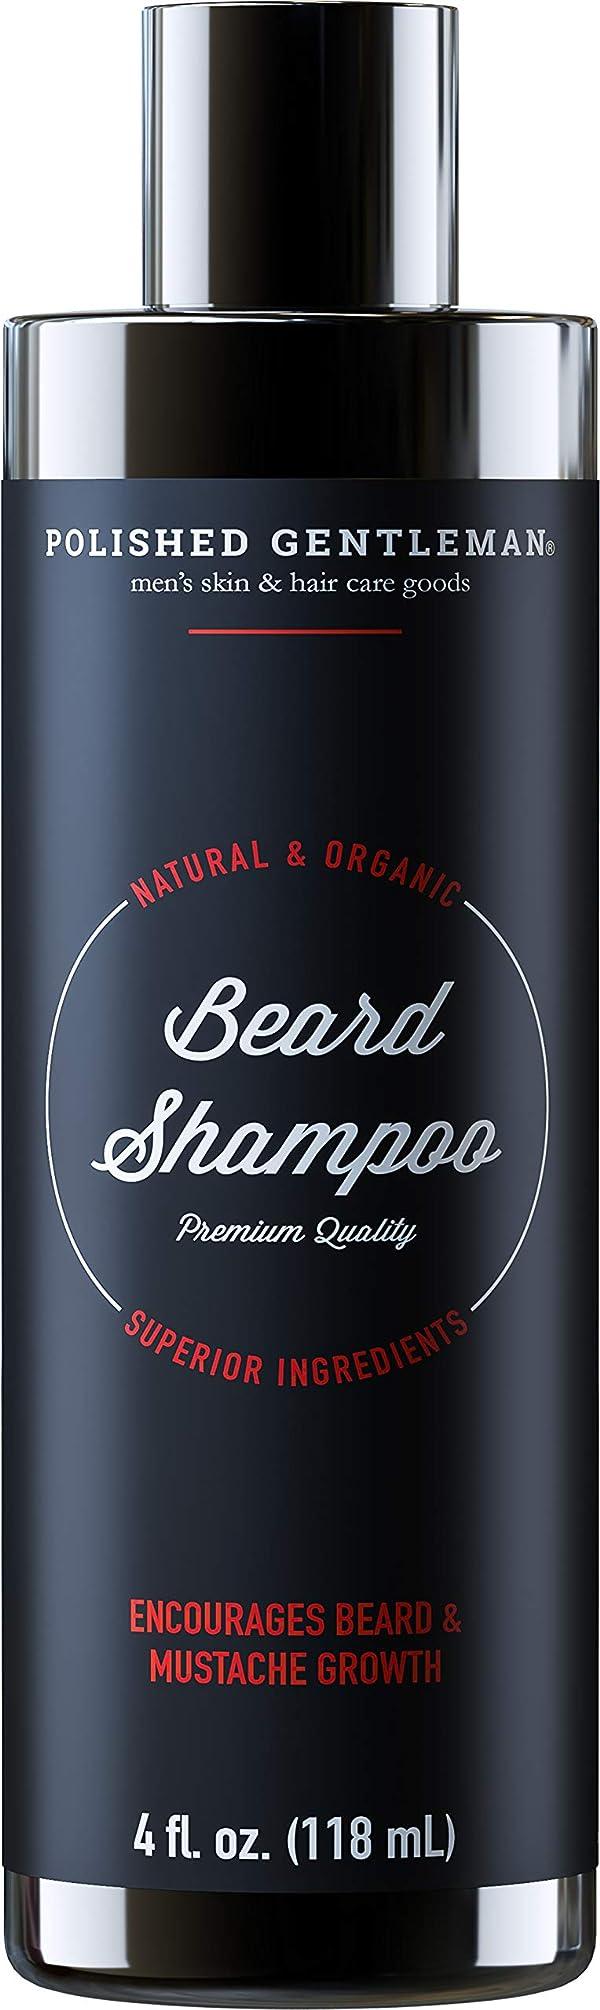 Beard Growth and Thickening Shampoo - With Organic Beard Oil